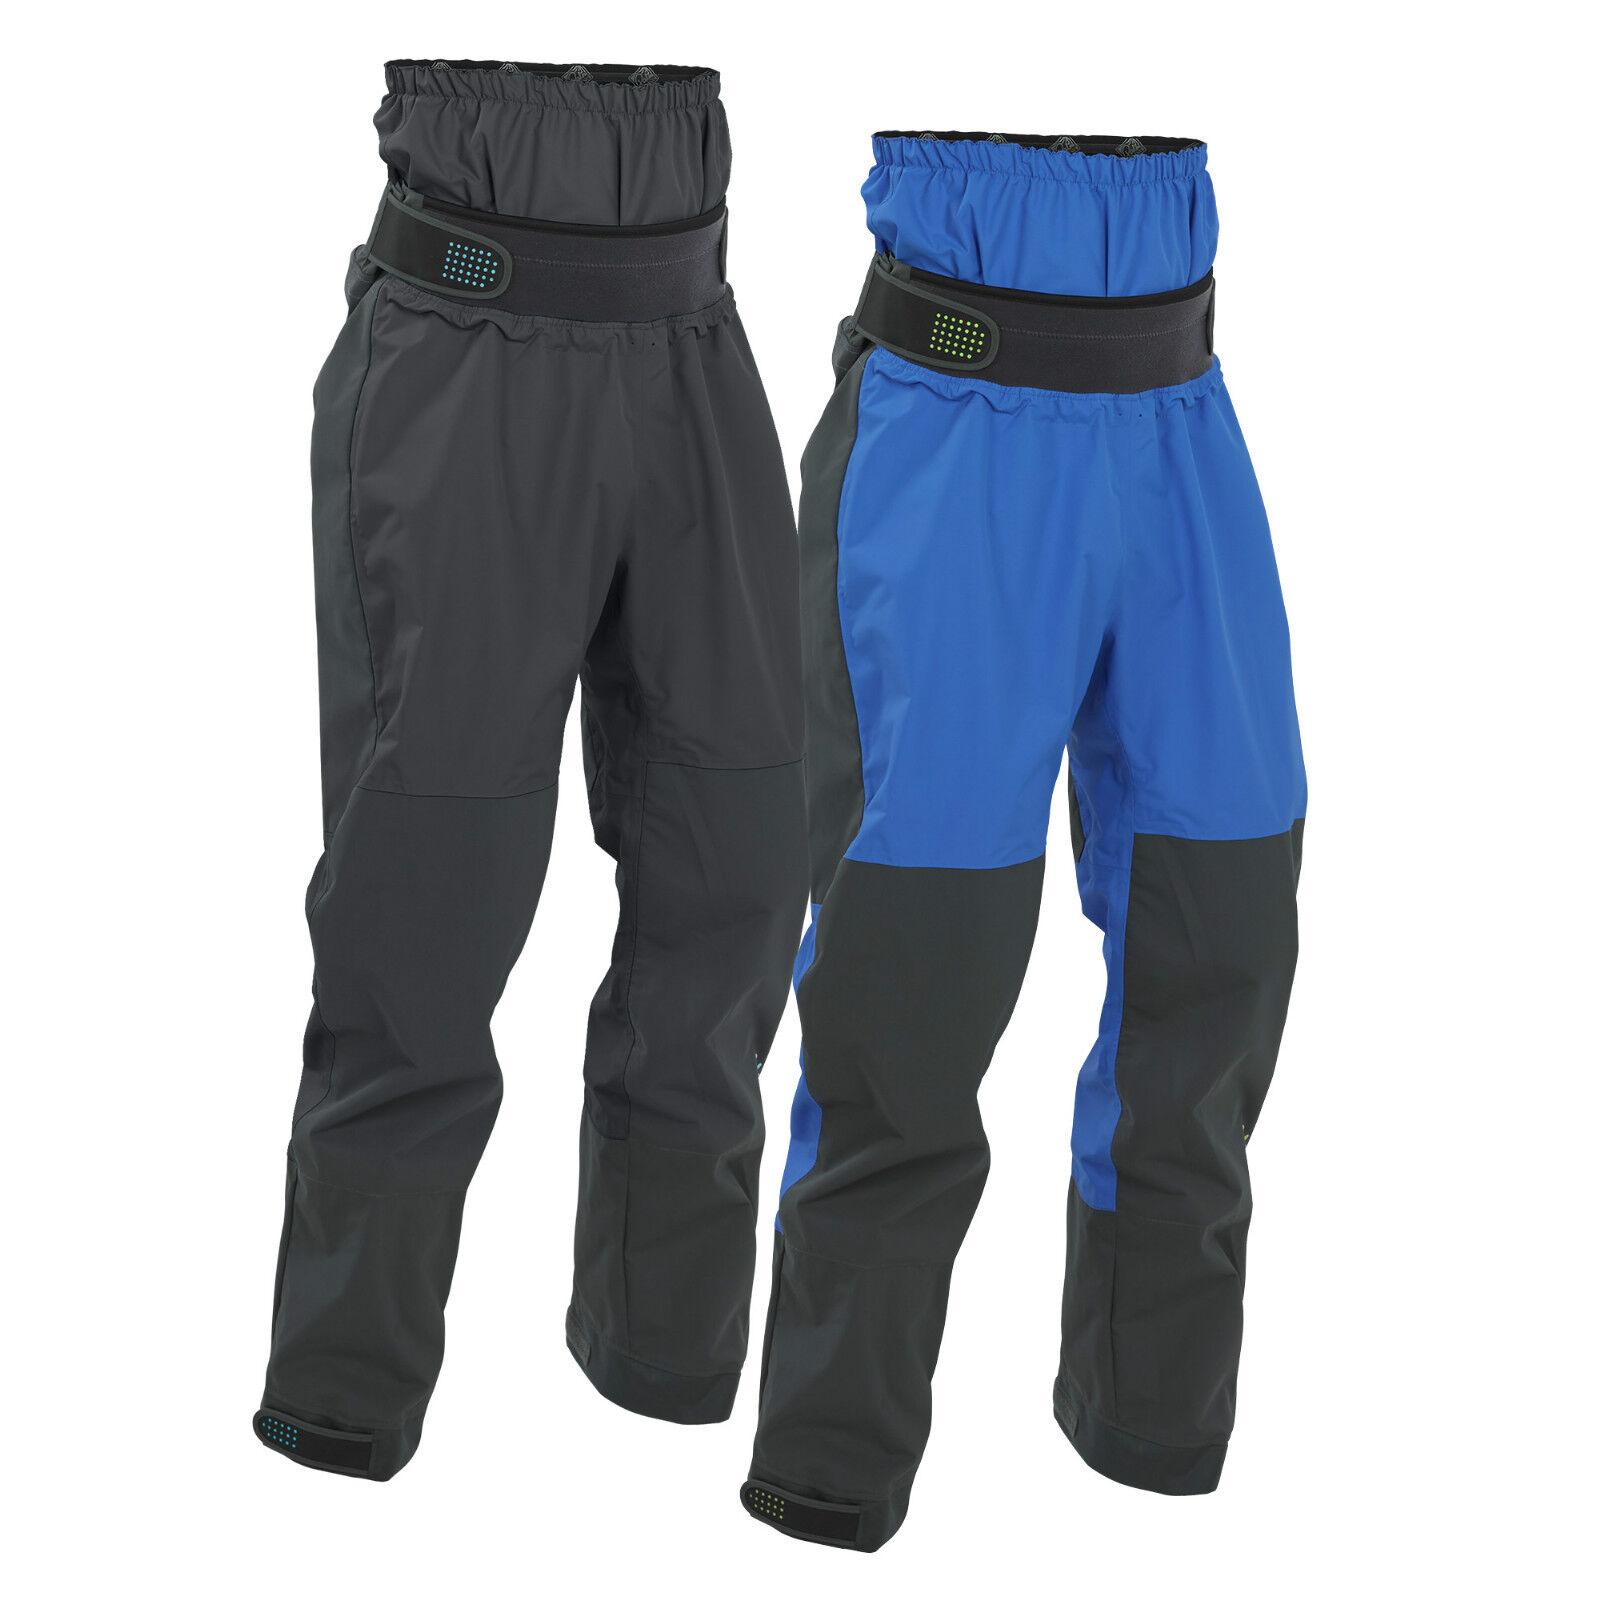 Palm Zenith Semi Dry Pants   Trousers for Canoe   Kayak   Fishing